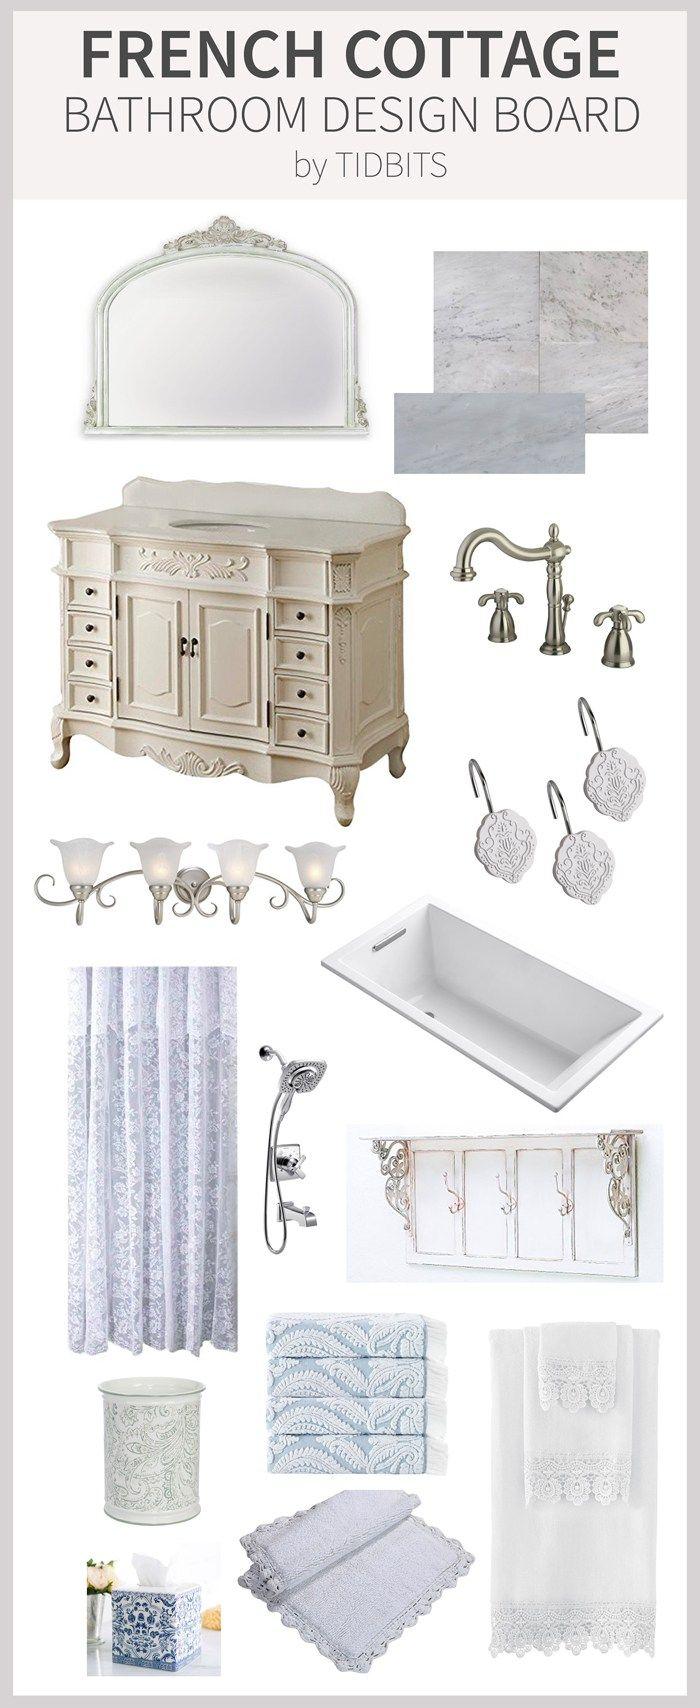 Paris Style Bathroom Decor: French Cottage Bathroom Design Board